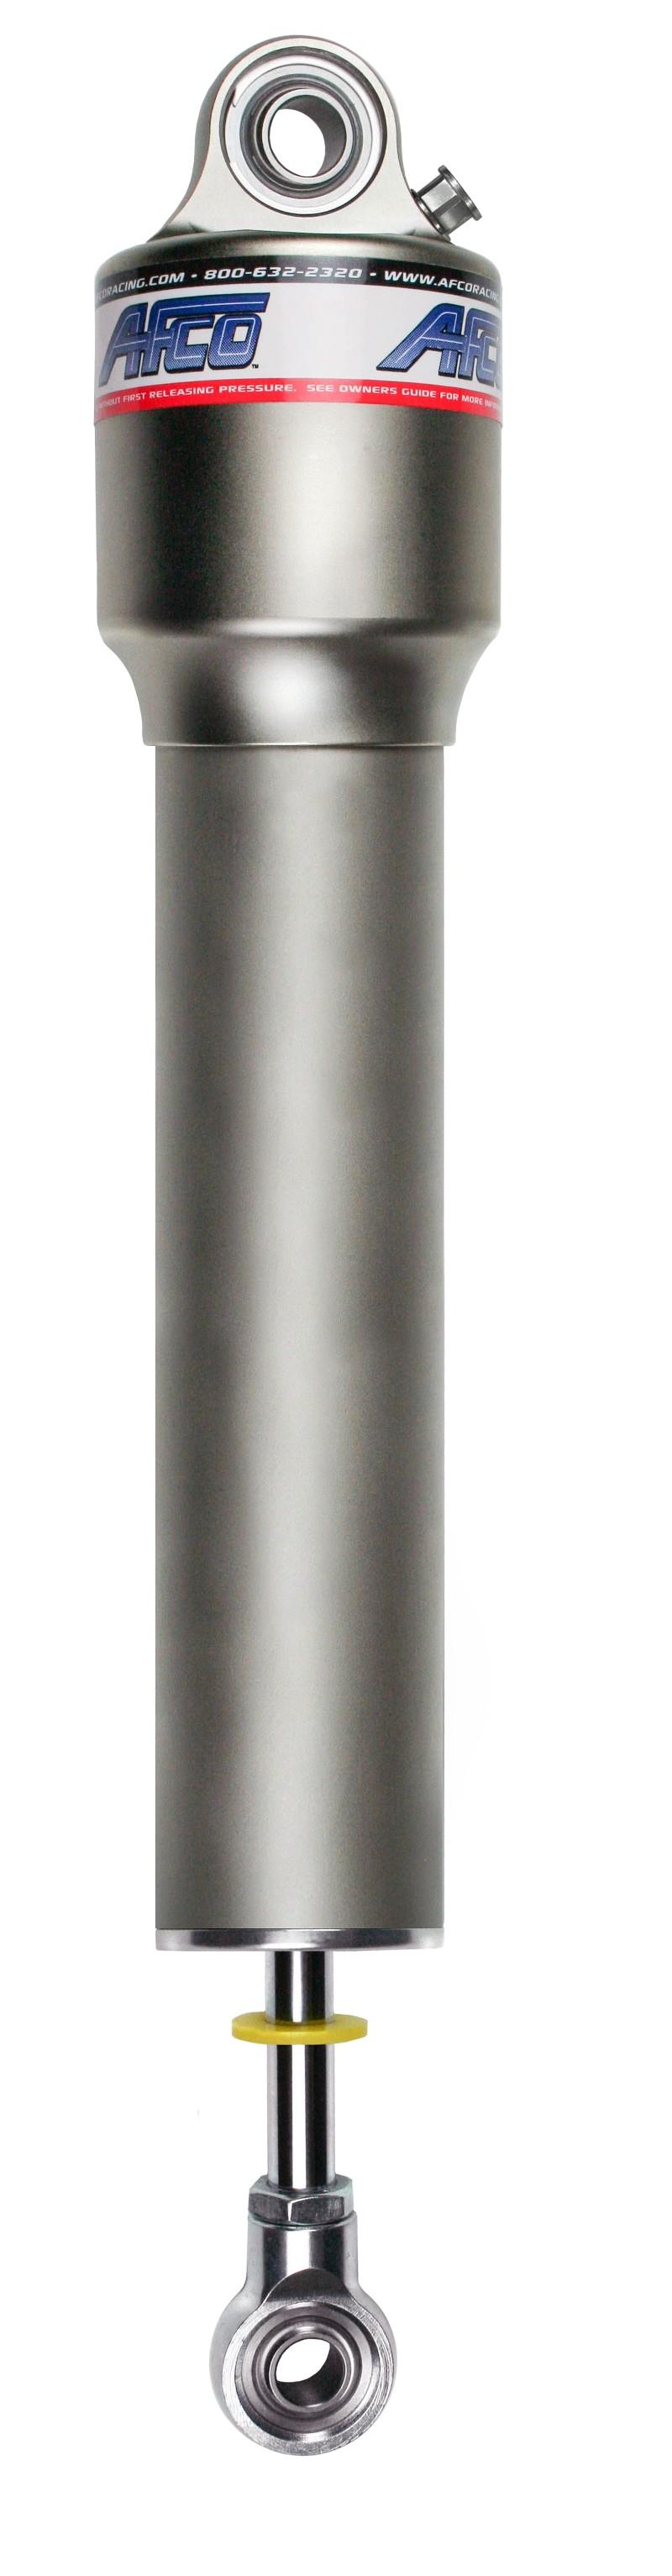 Steel Shock Mono-tube 56 Series 7 Inch Stroke Bulb Base Valve IMCA Approved